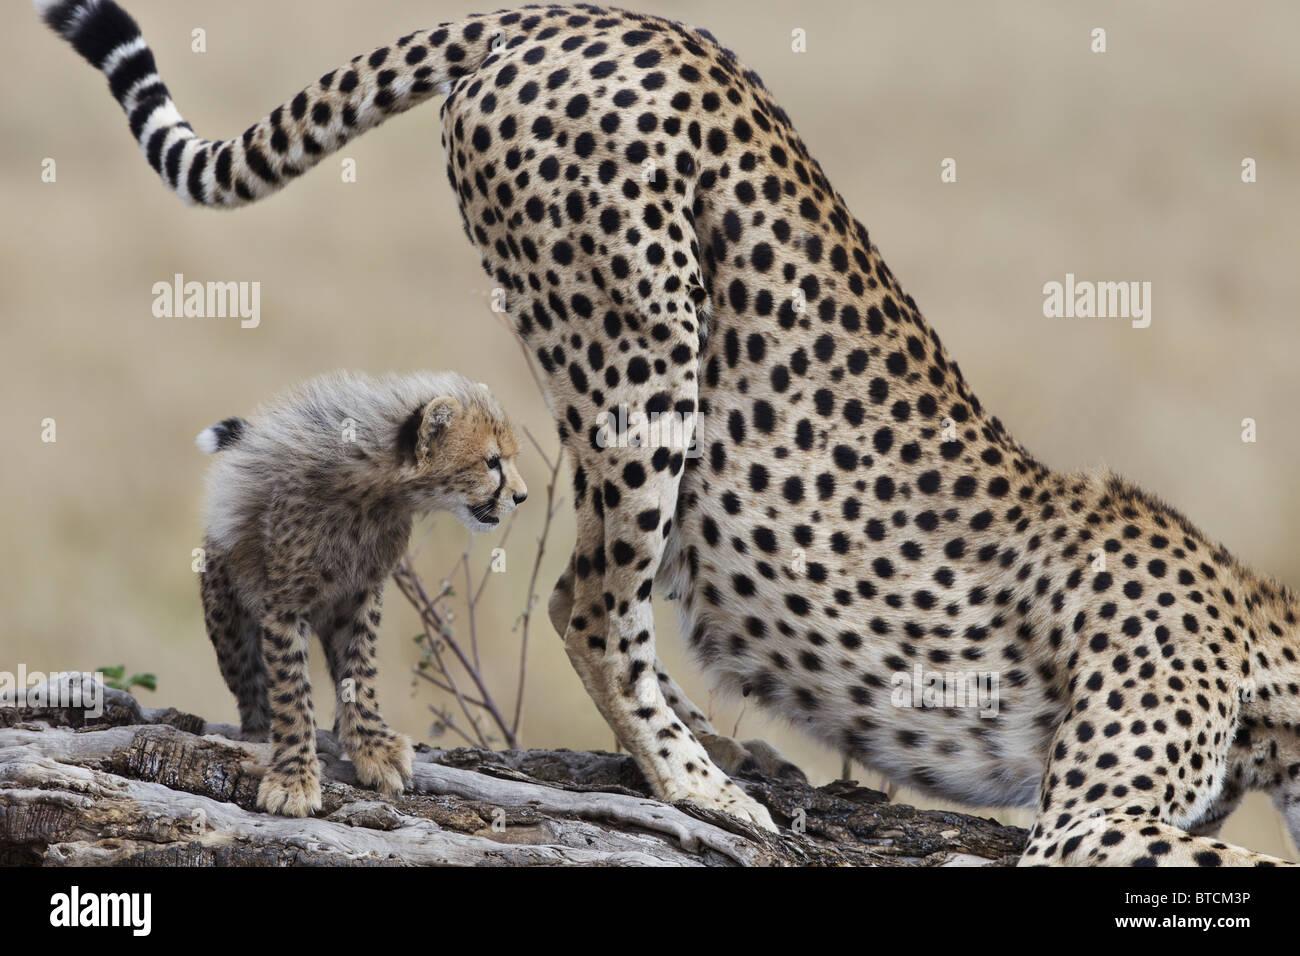 Cheetah female(Acinonyx jubatus) with cub scent marking. - Stock Image